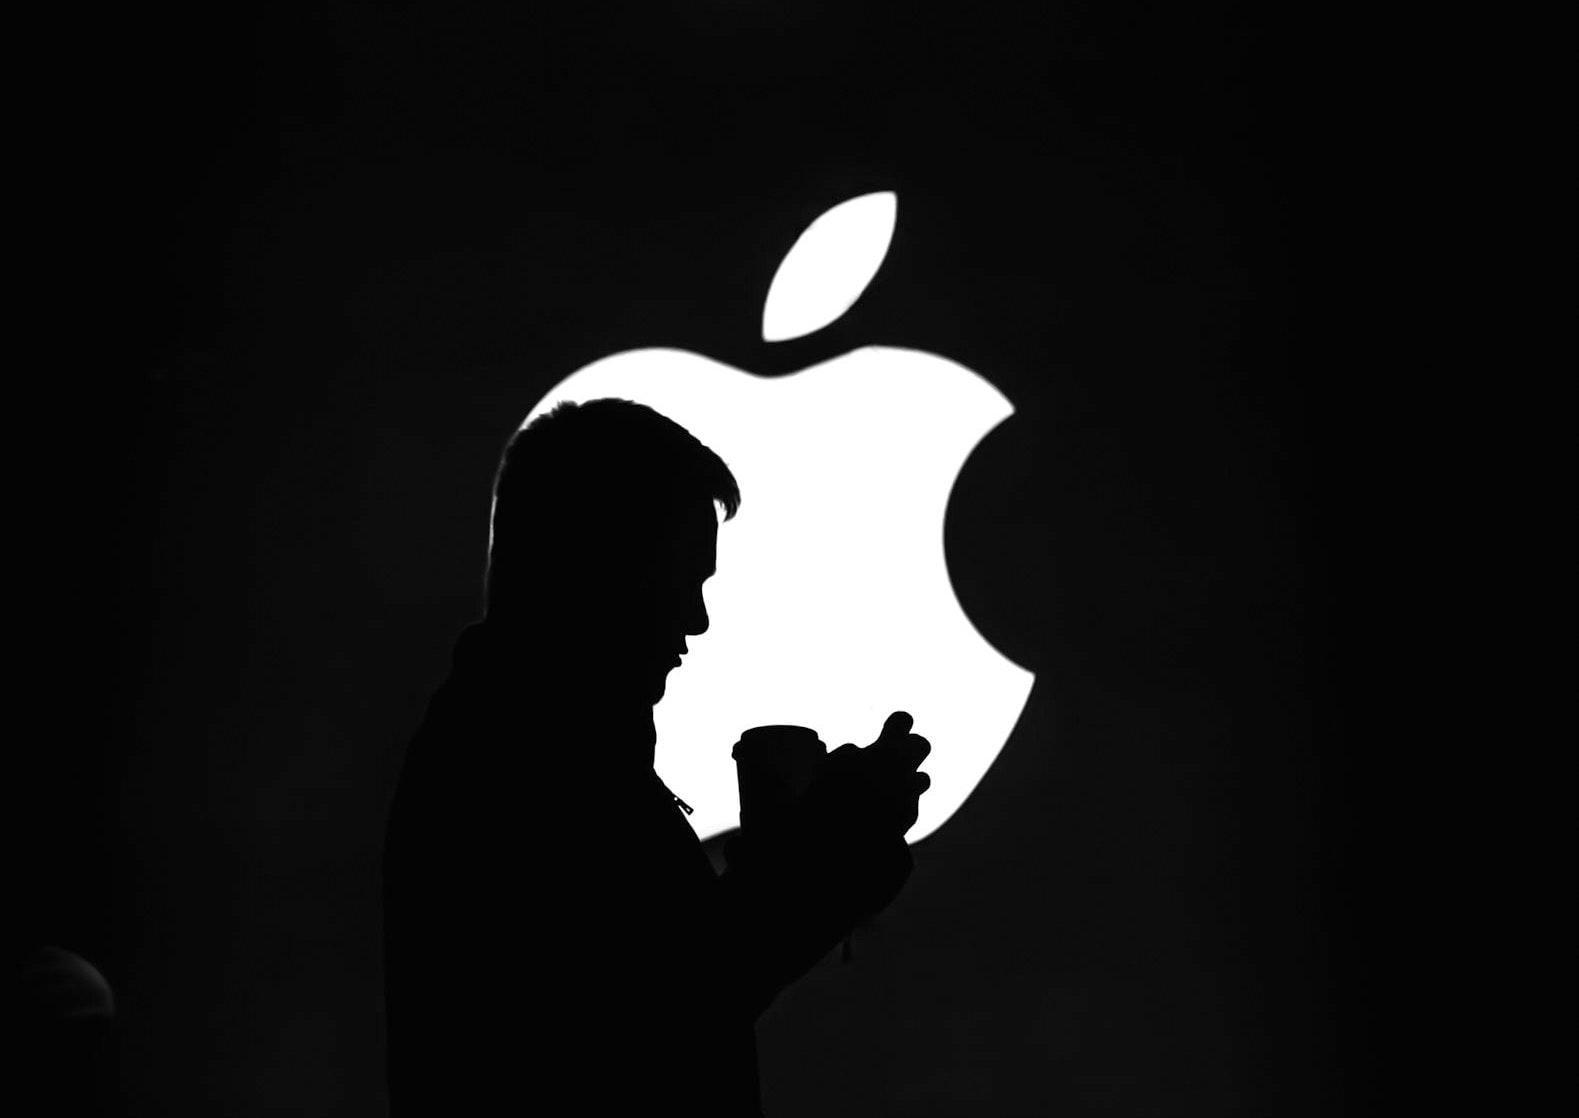 apple iphone homepod bloomberg